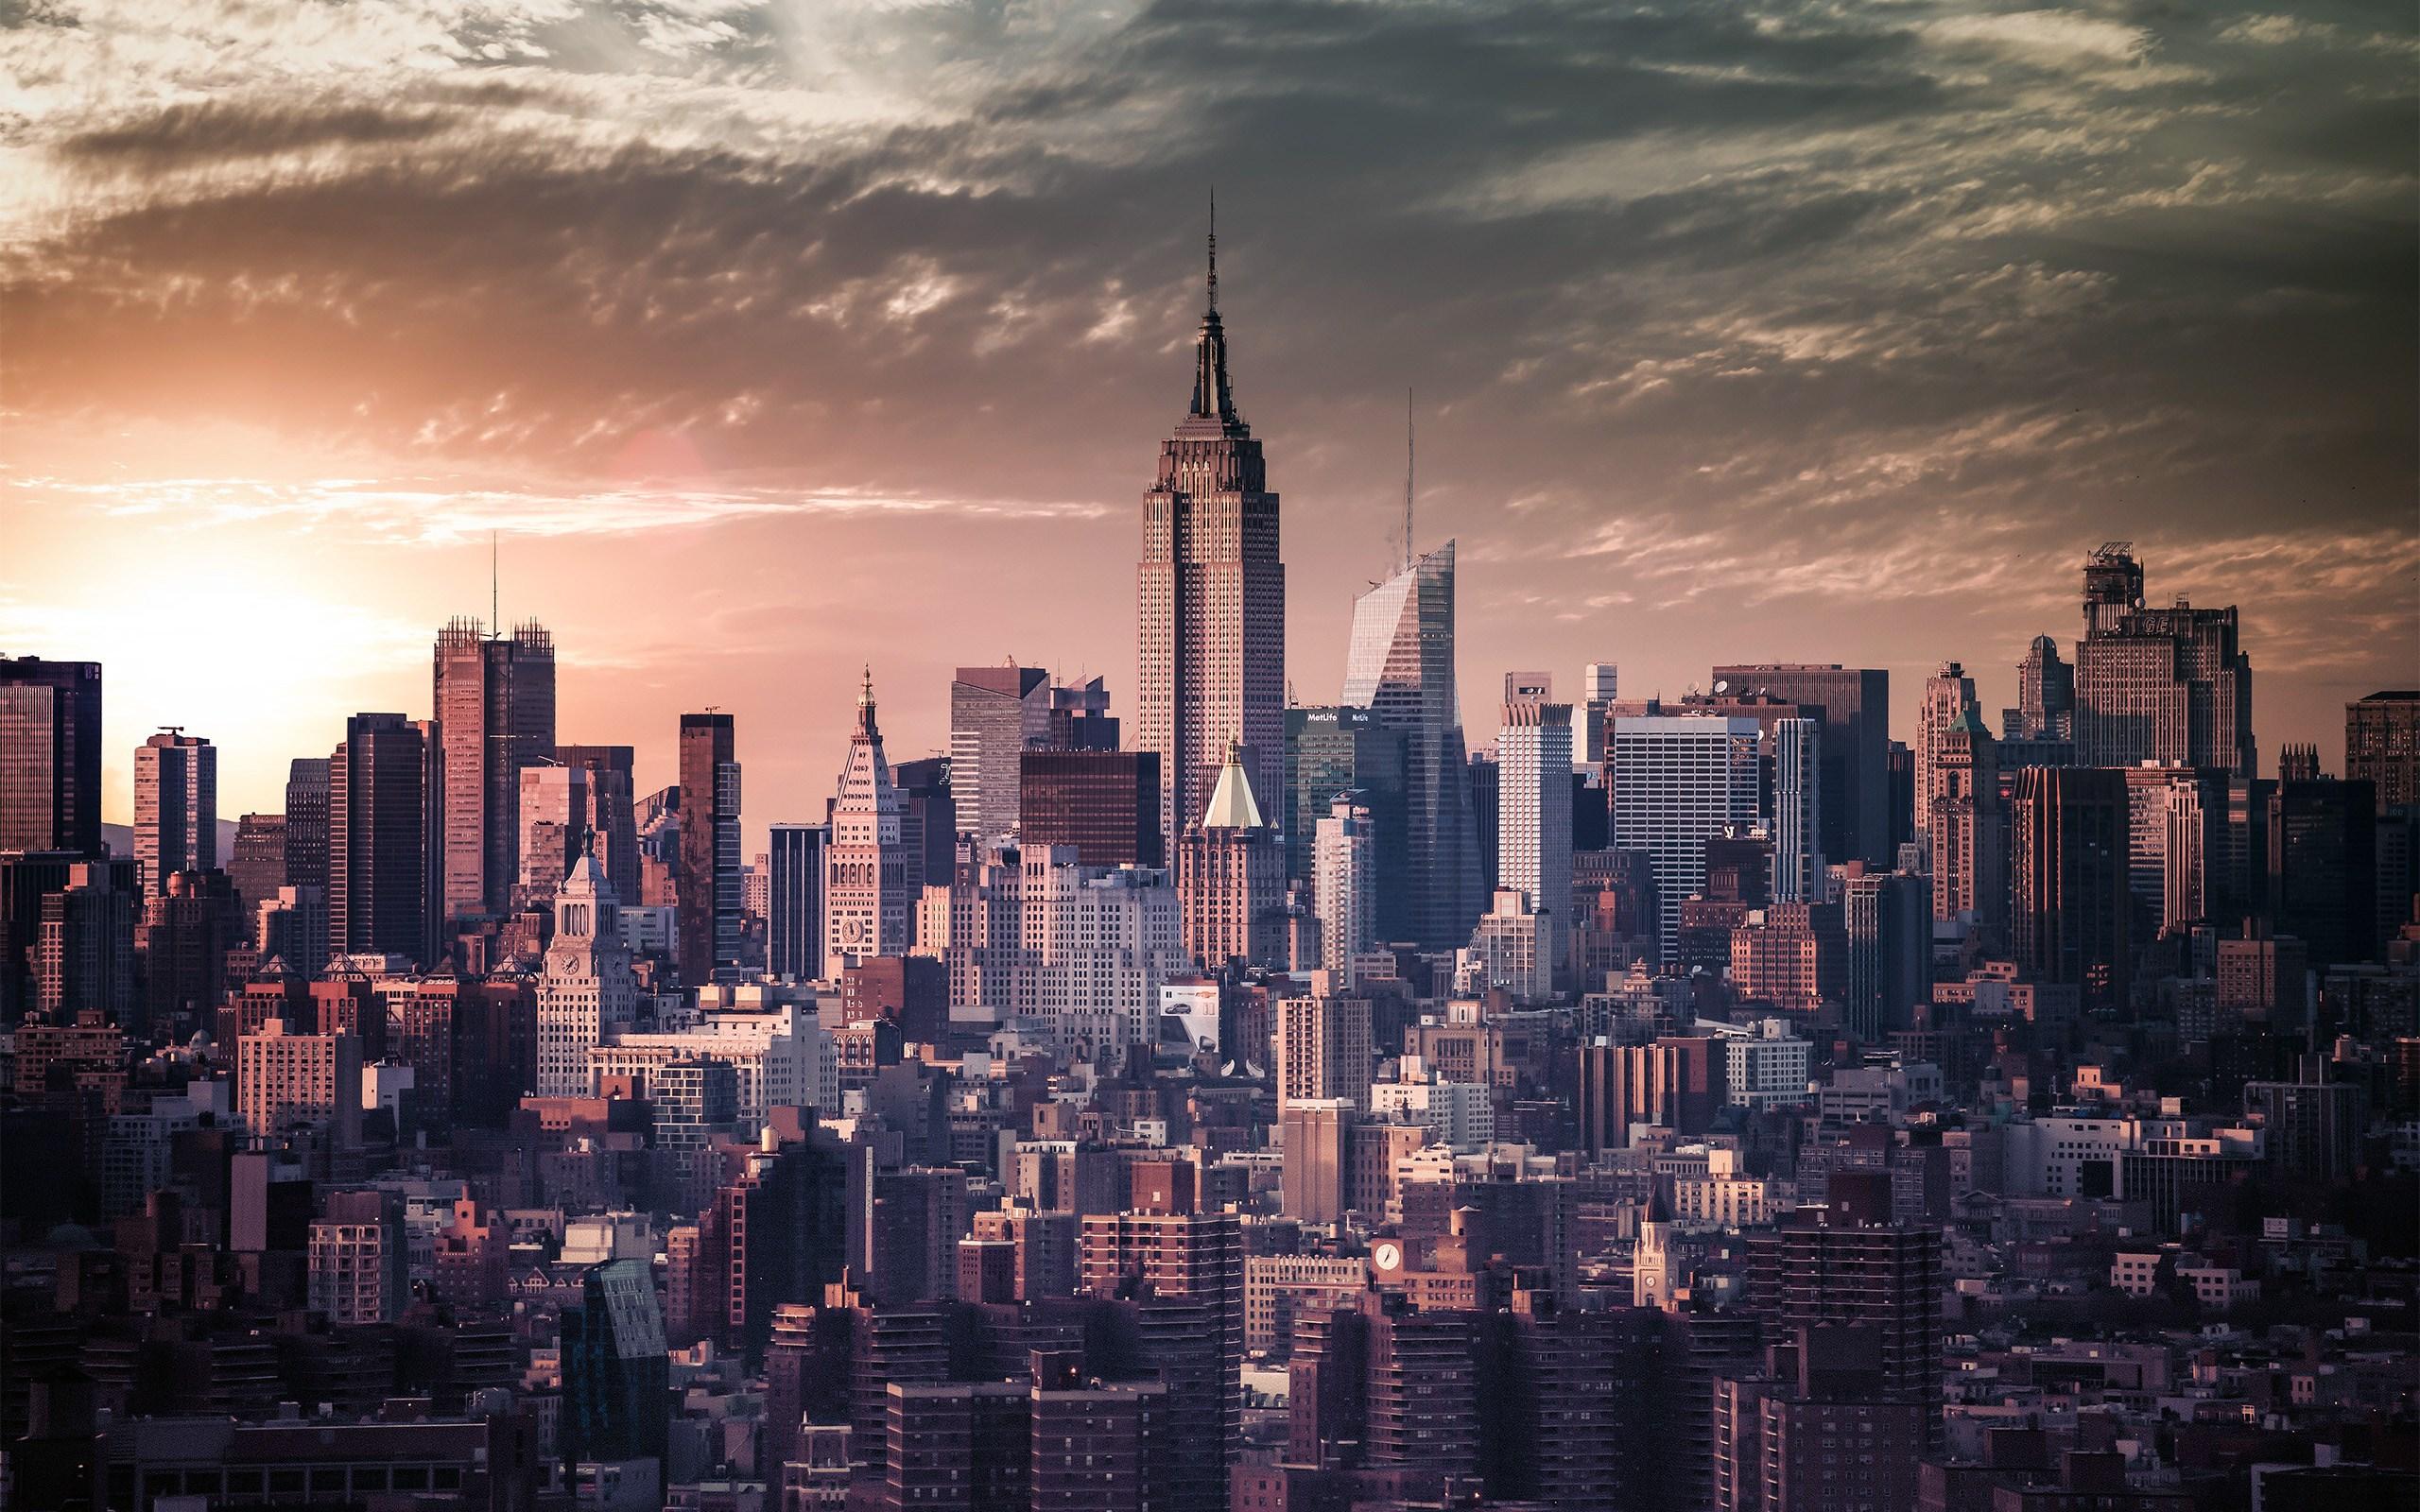 city new york vintage photo skyscrapers evening hd wallpaper 2560x1600